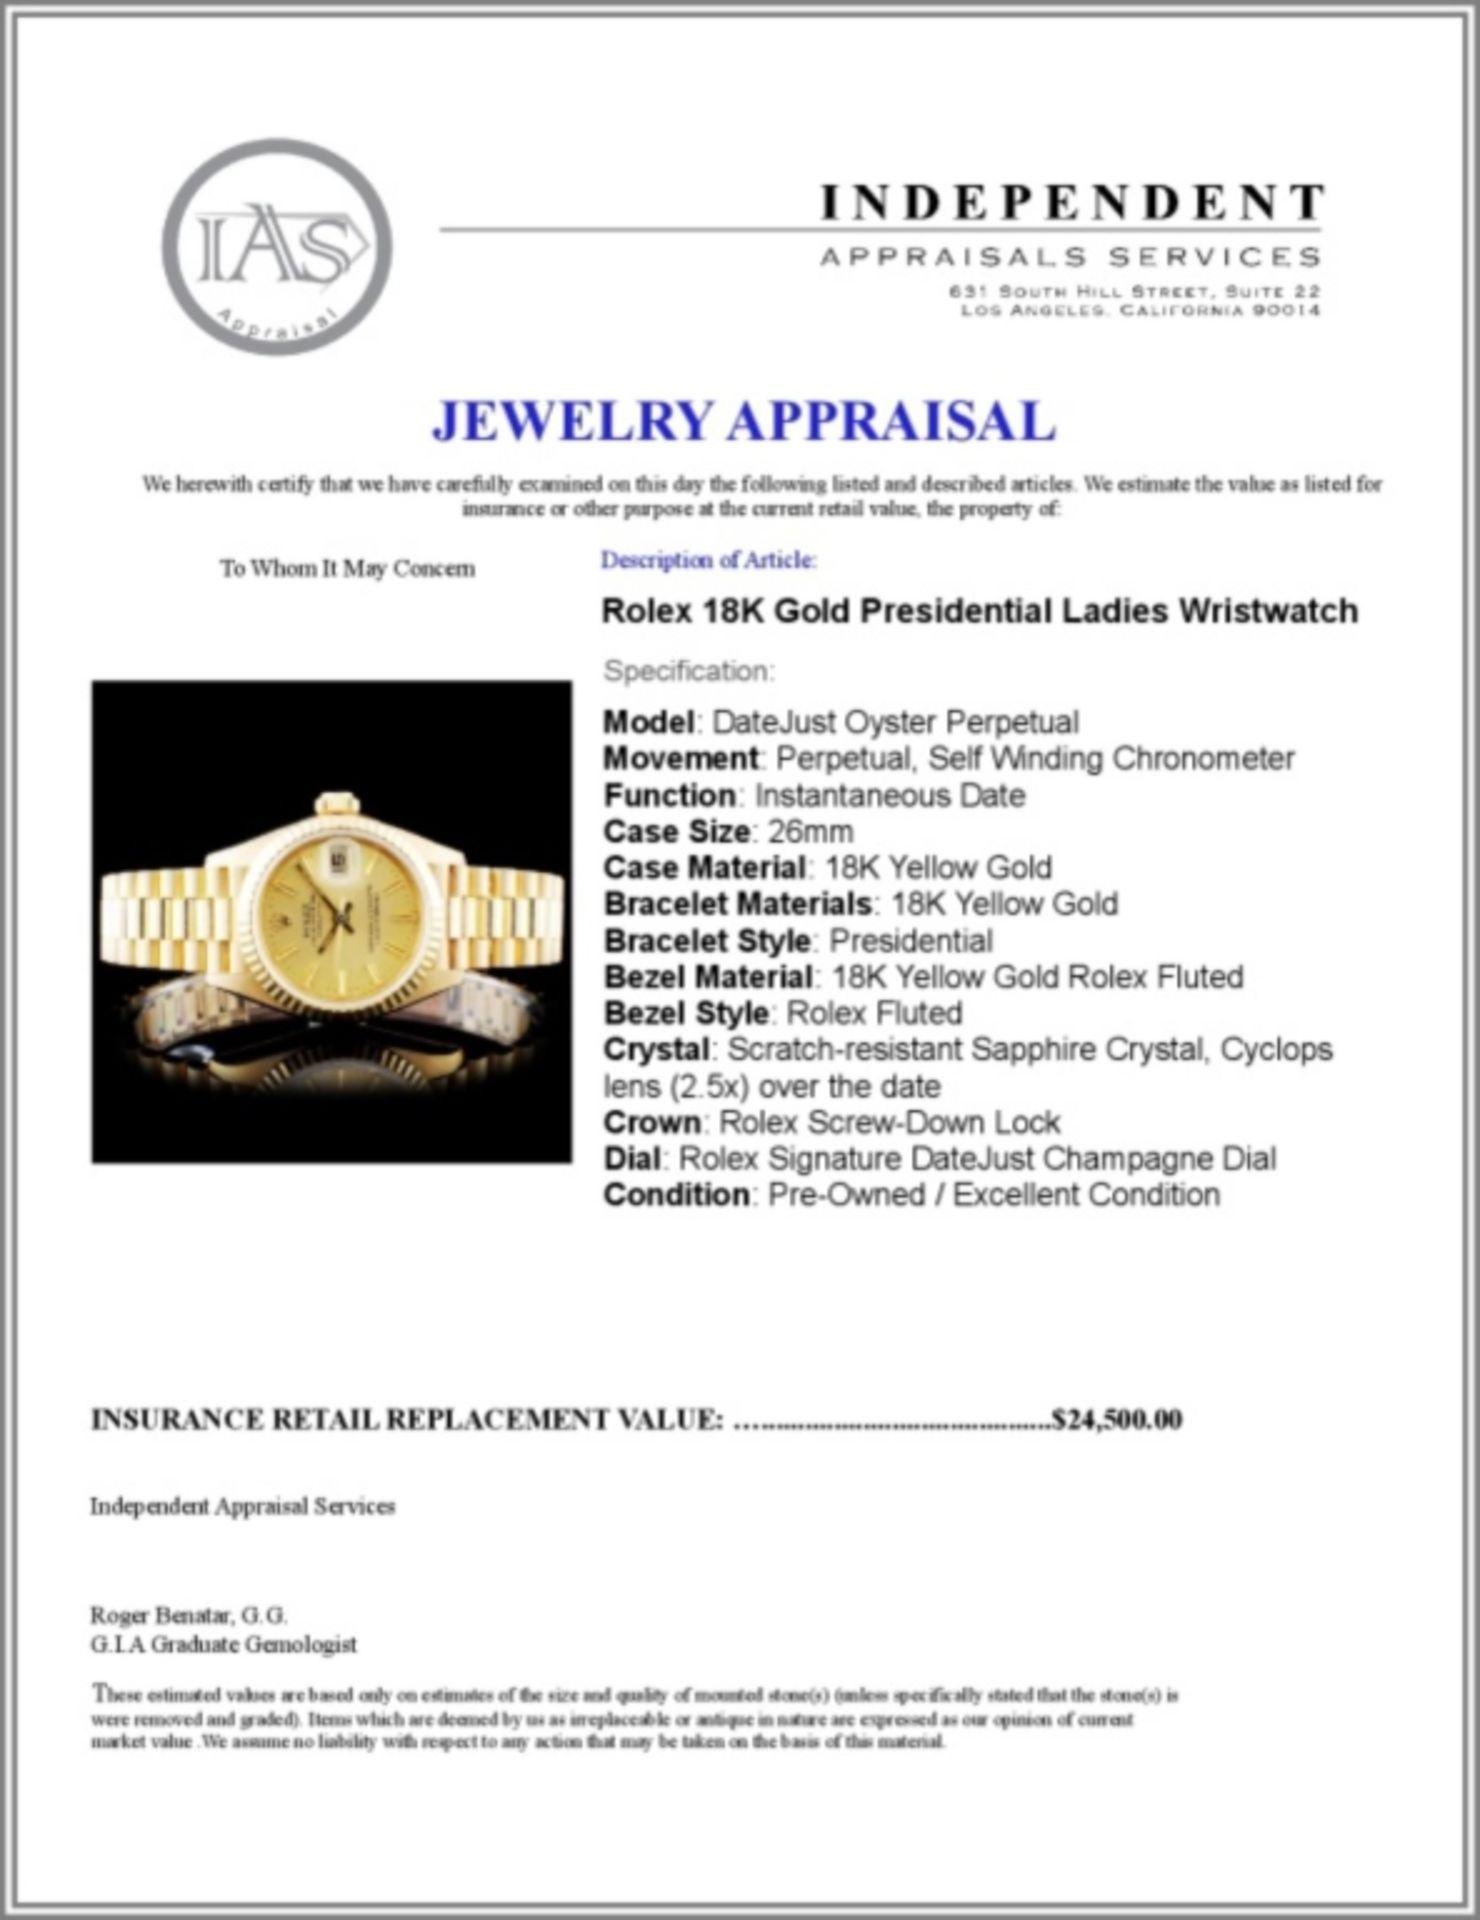 Rolex 18K Gold Presidential Ladies Wristwatch - Image 5 of 5